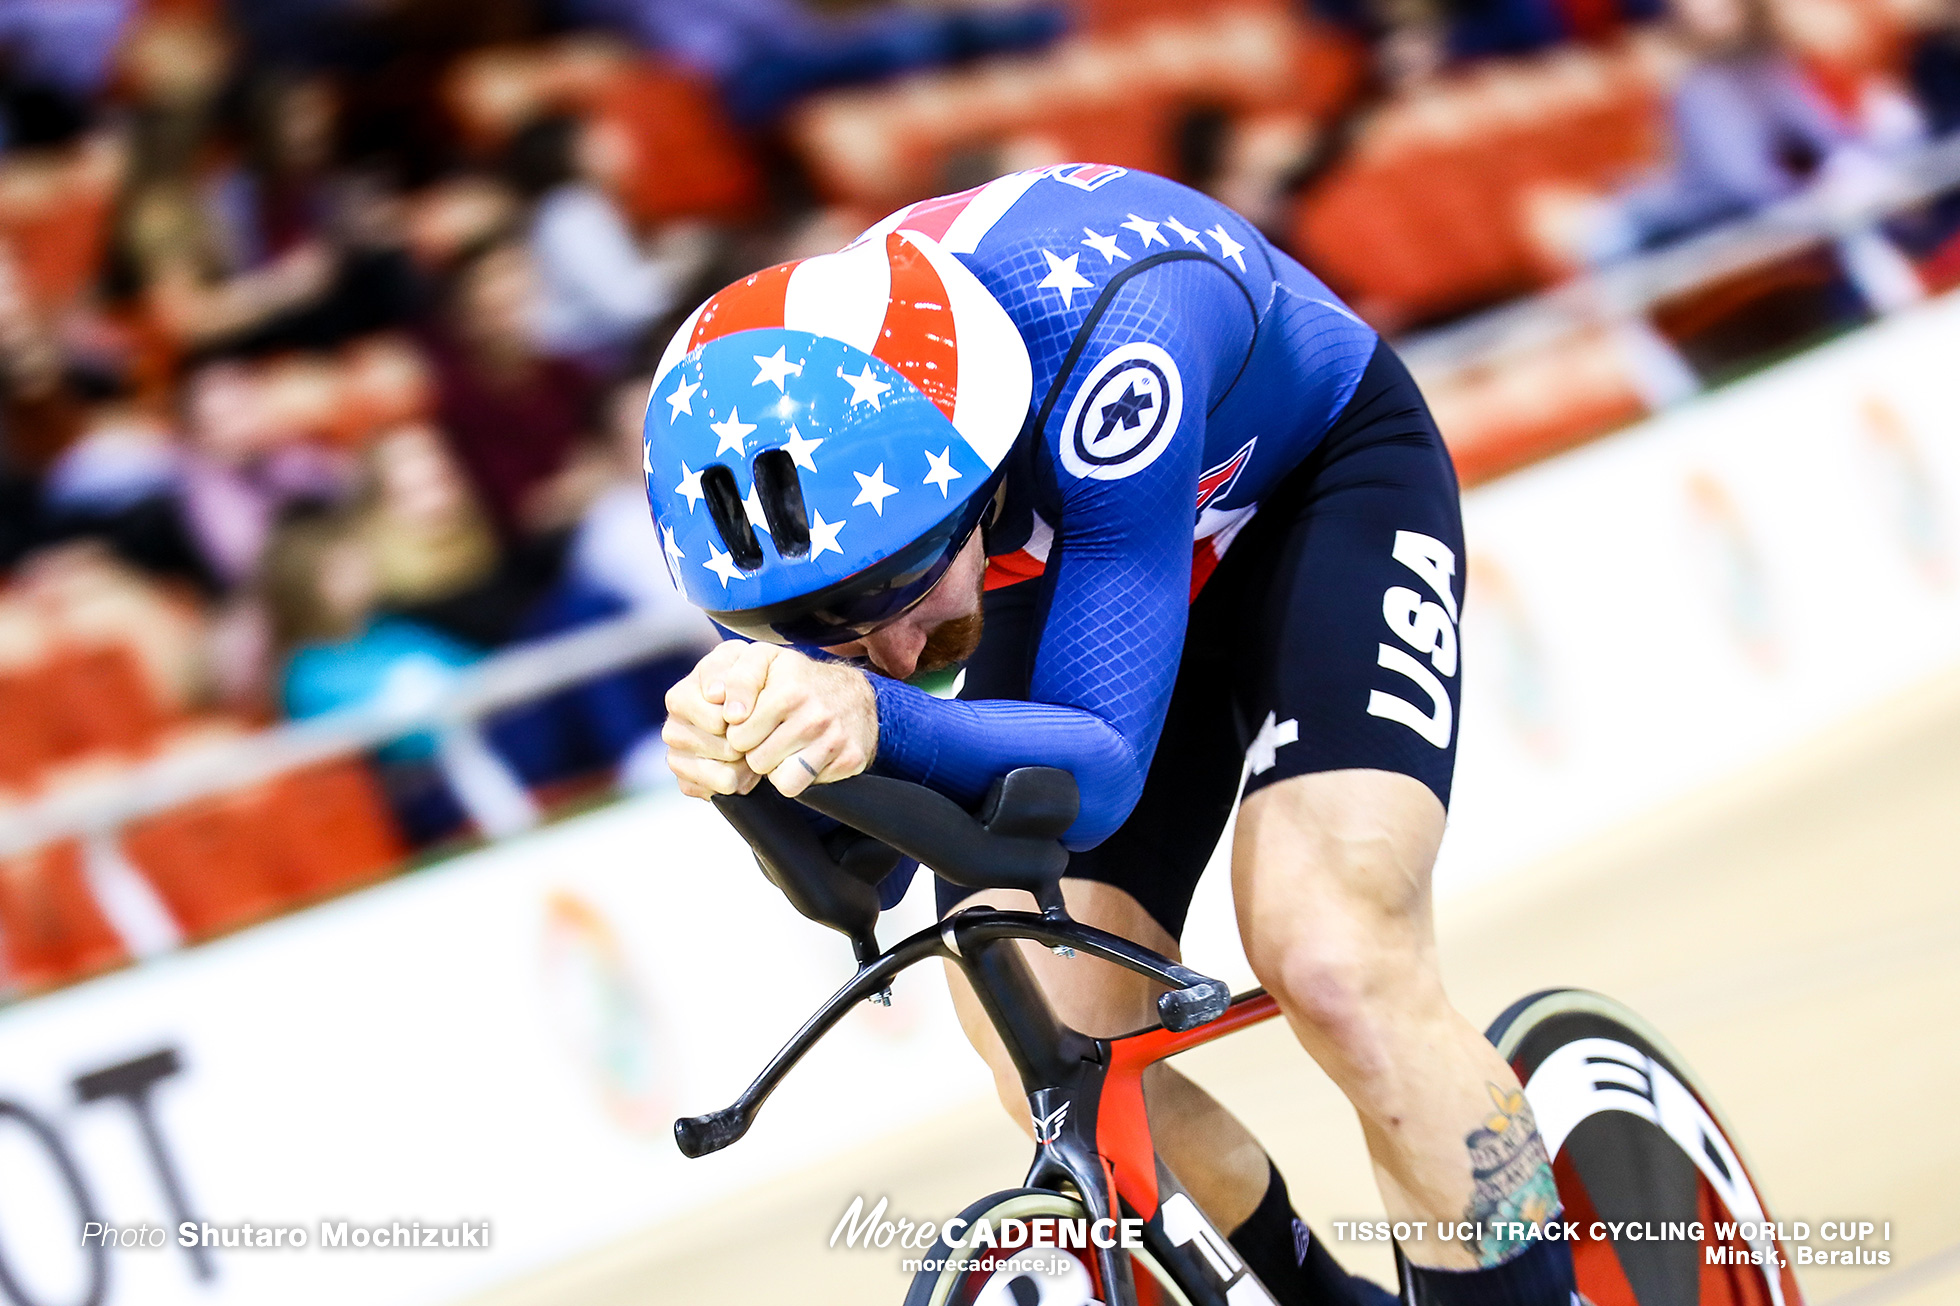 Ashton LAMBIE, Qualifying / Men's Individual Pursuit / TISSOT UCI TRACK CYCLING WORLD CUP I, Minsk, Beralus